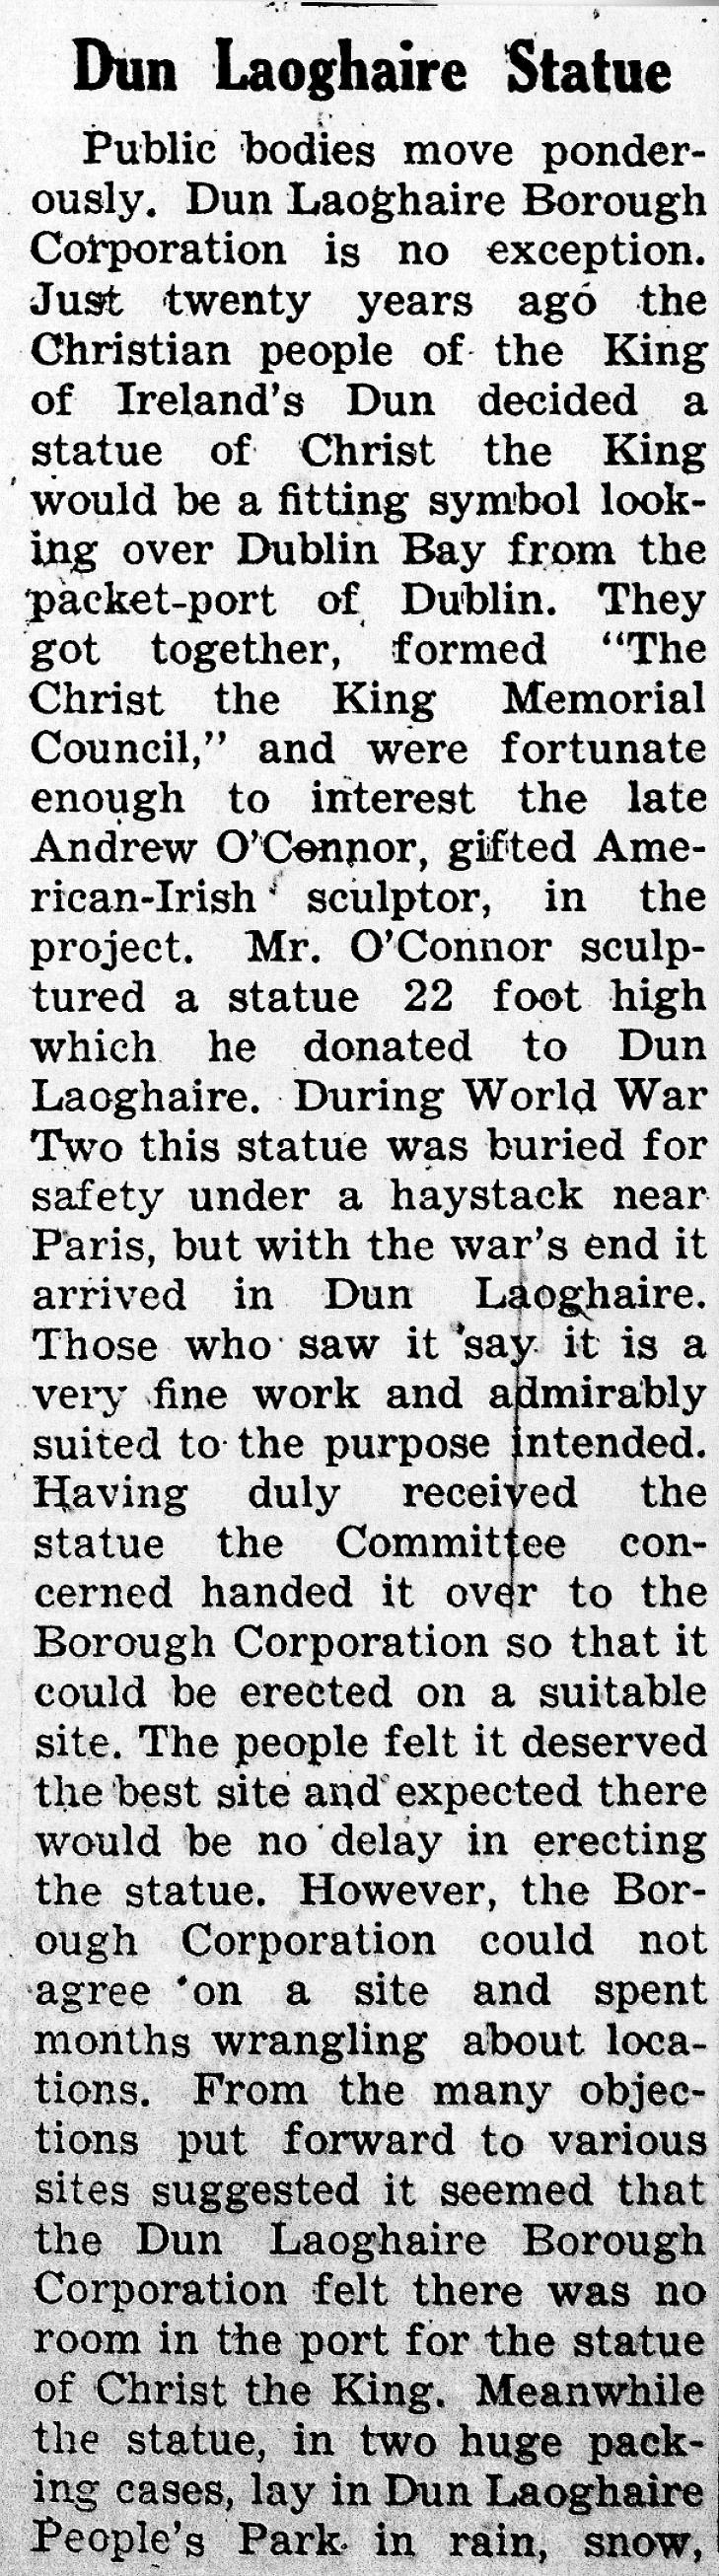 Nenagh Guardian 27 Jan 1951 Dun Laoghaire A